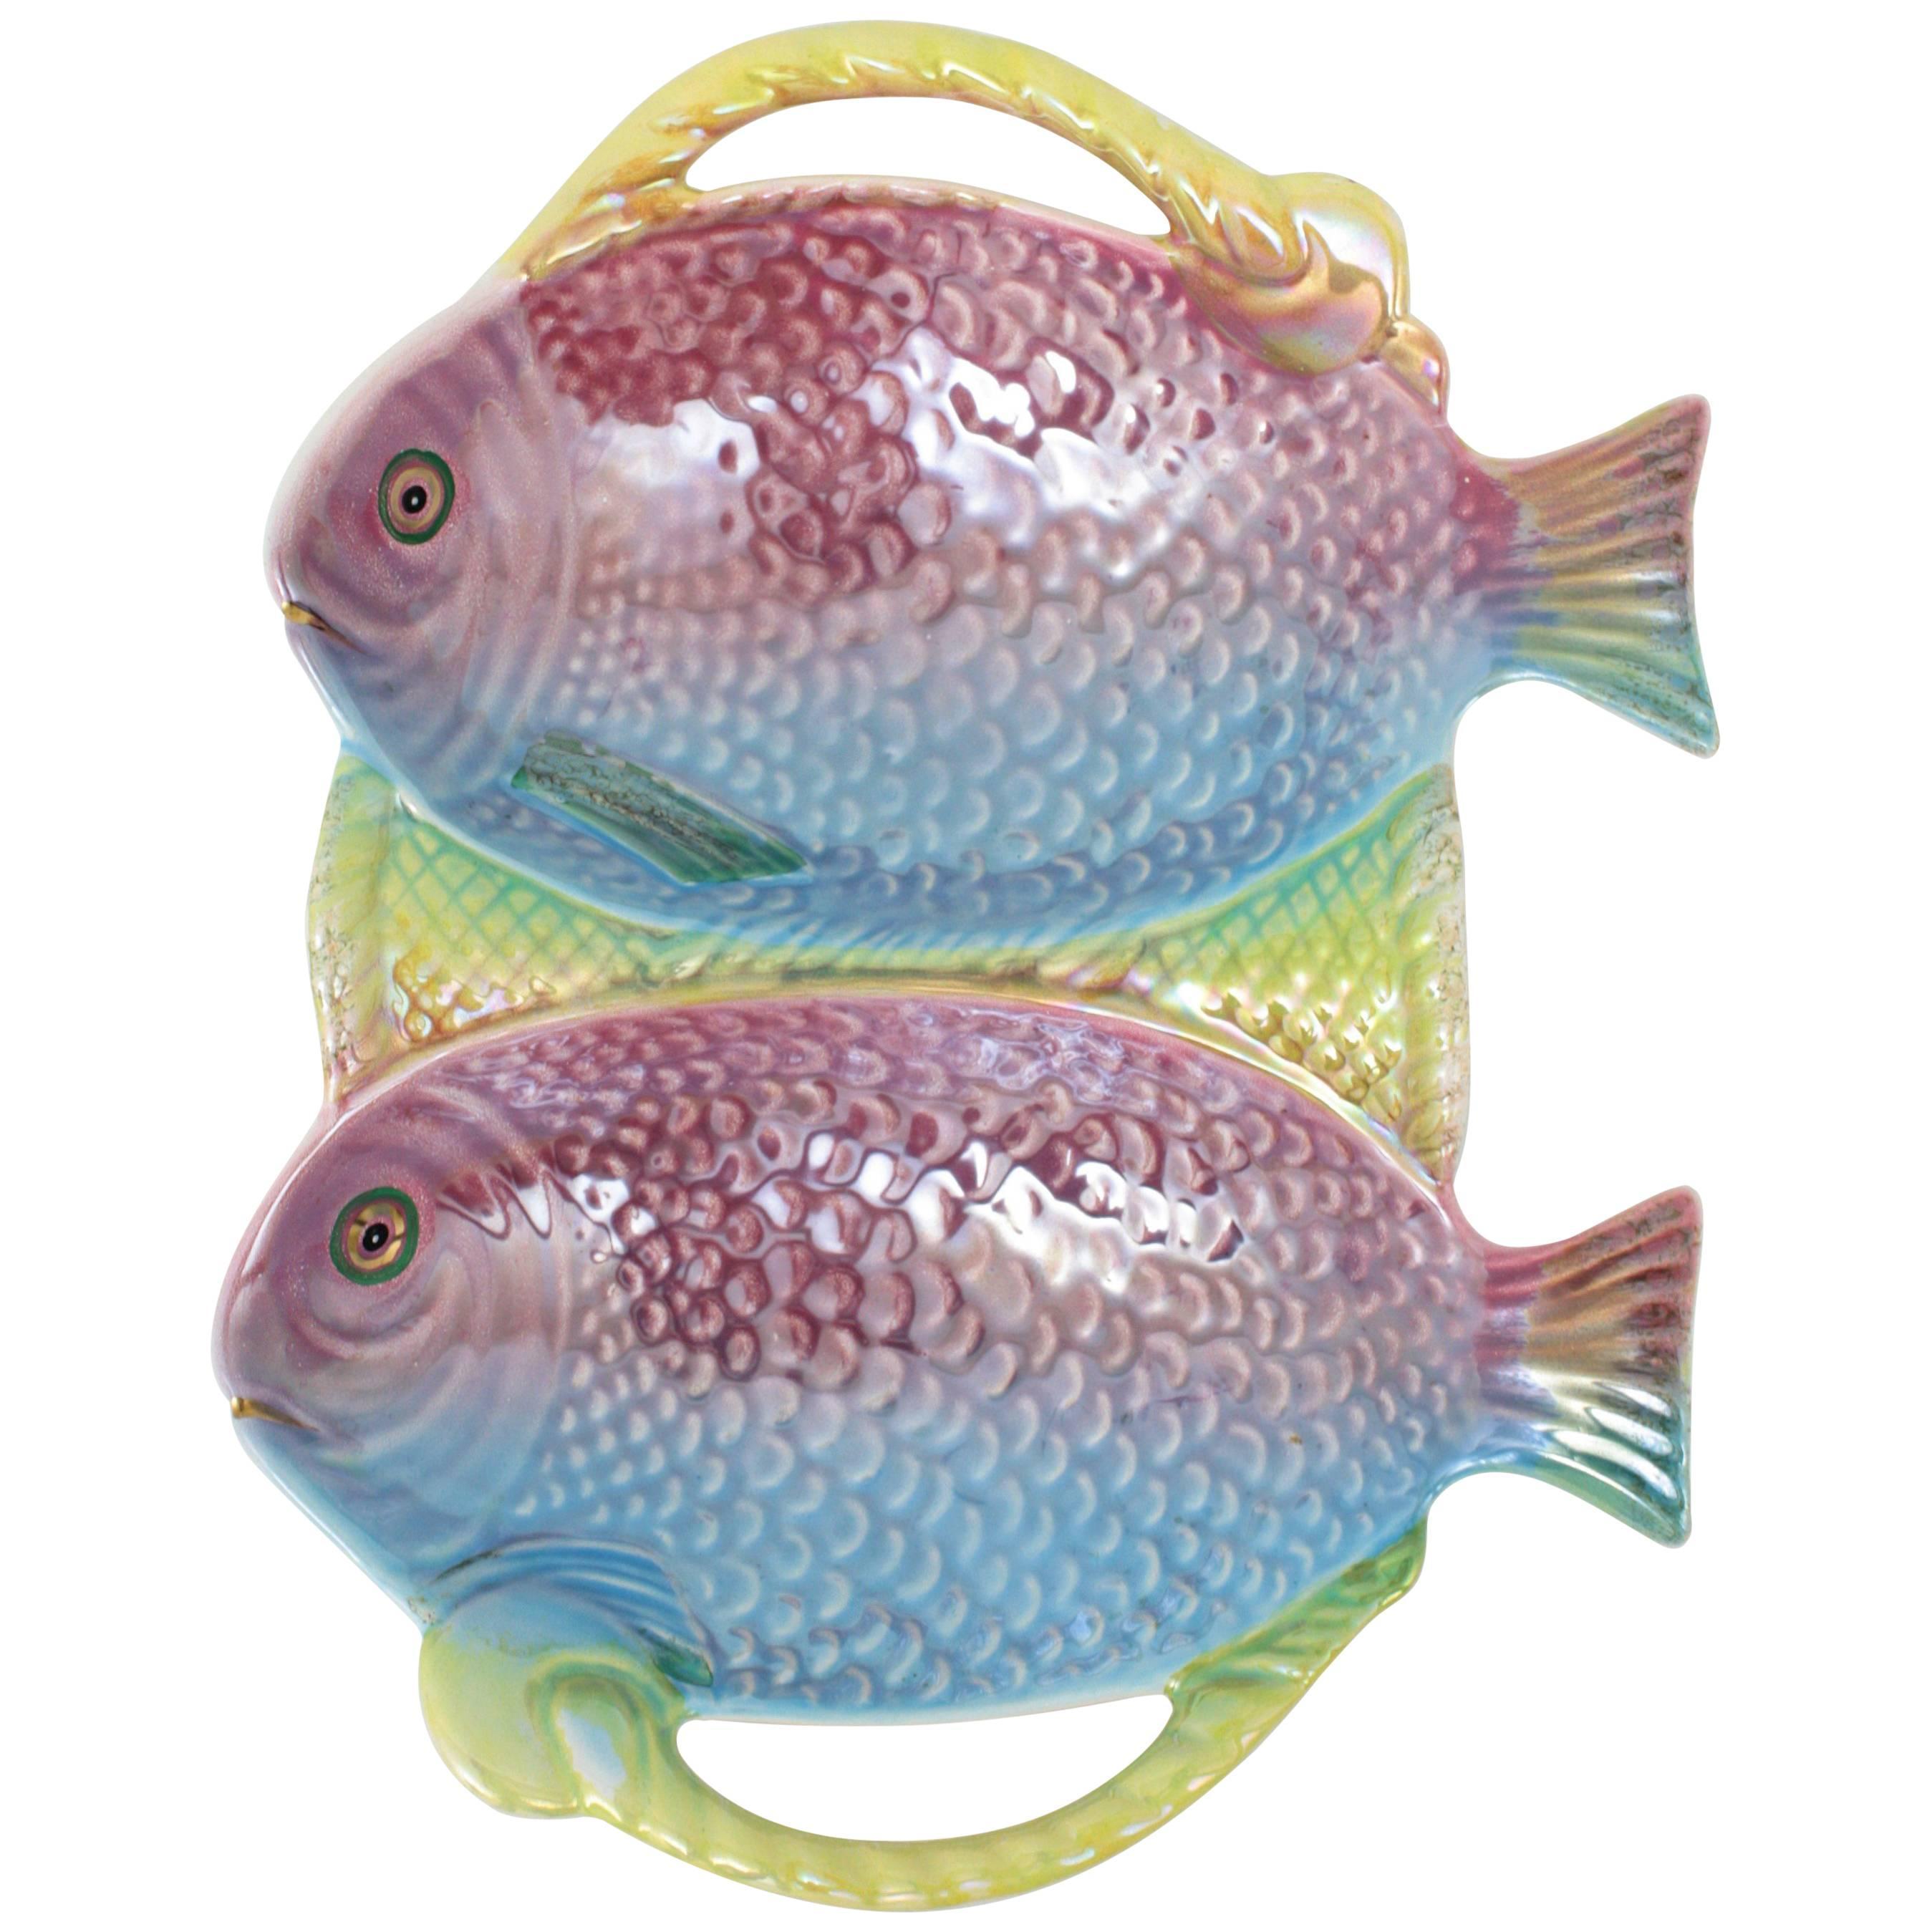 Vintage Pastel Colors Majolica Glazed Ceramic Fish Platter, Portugal, 1960s